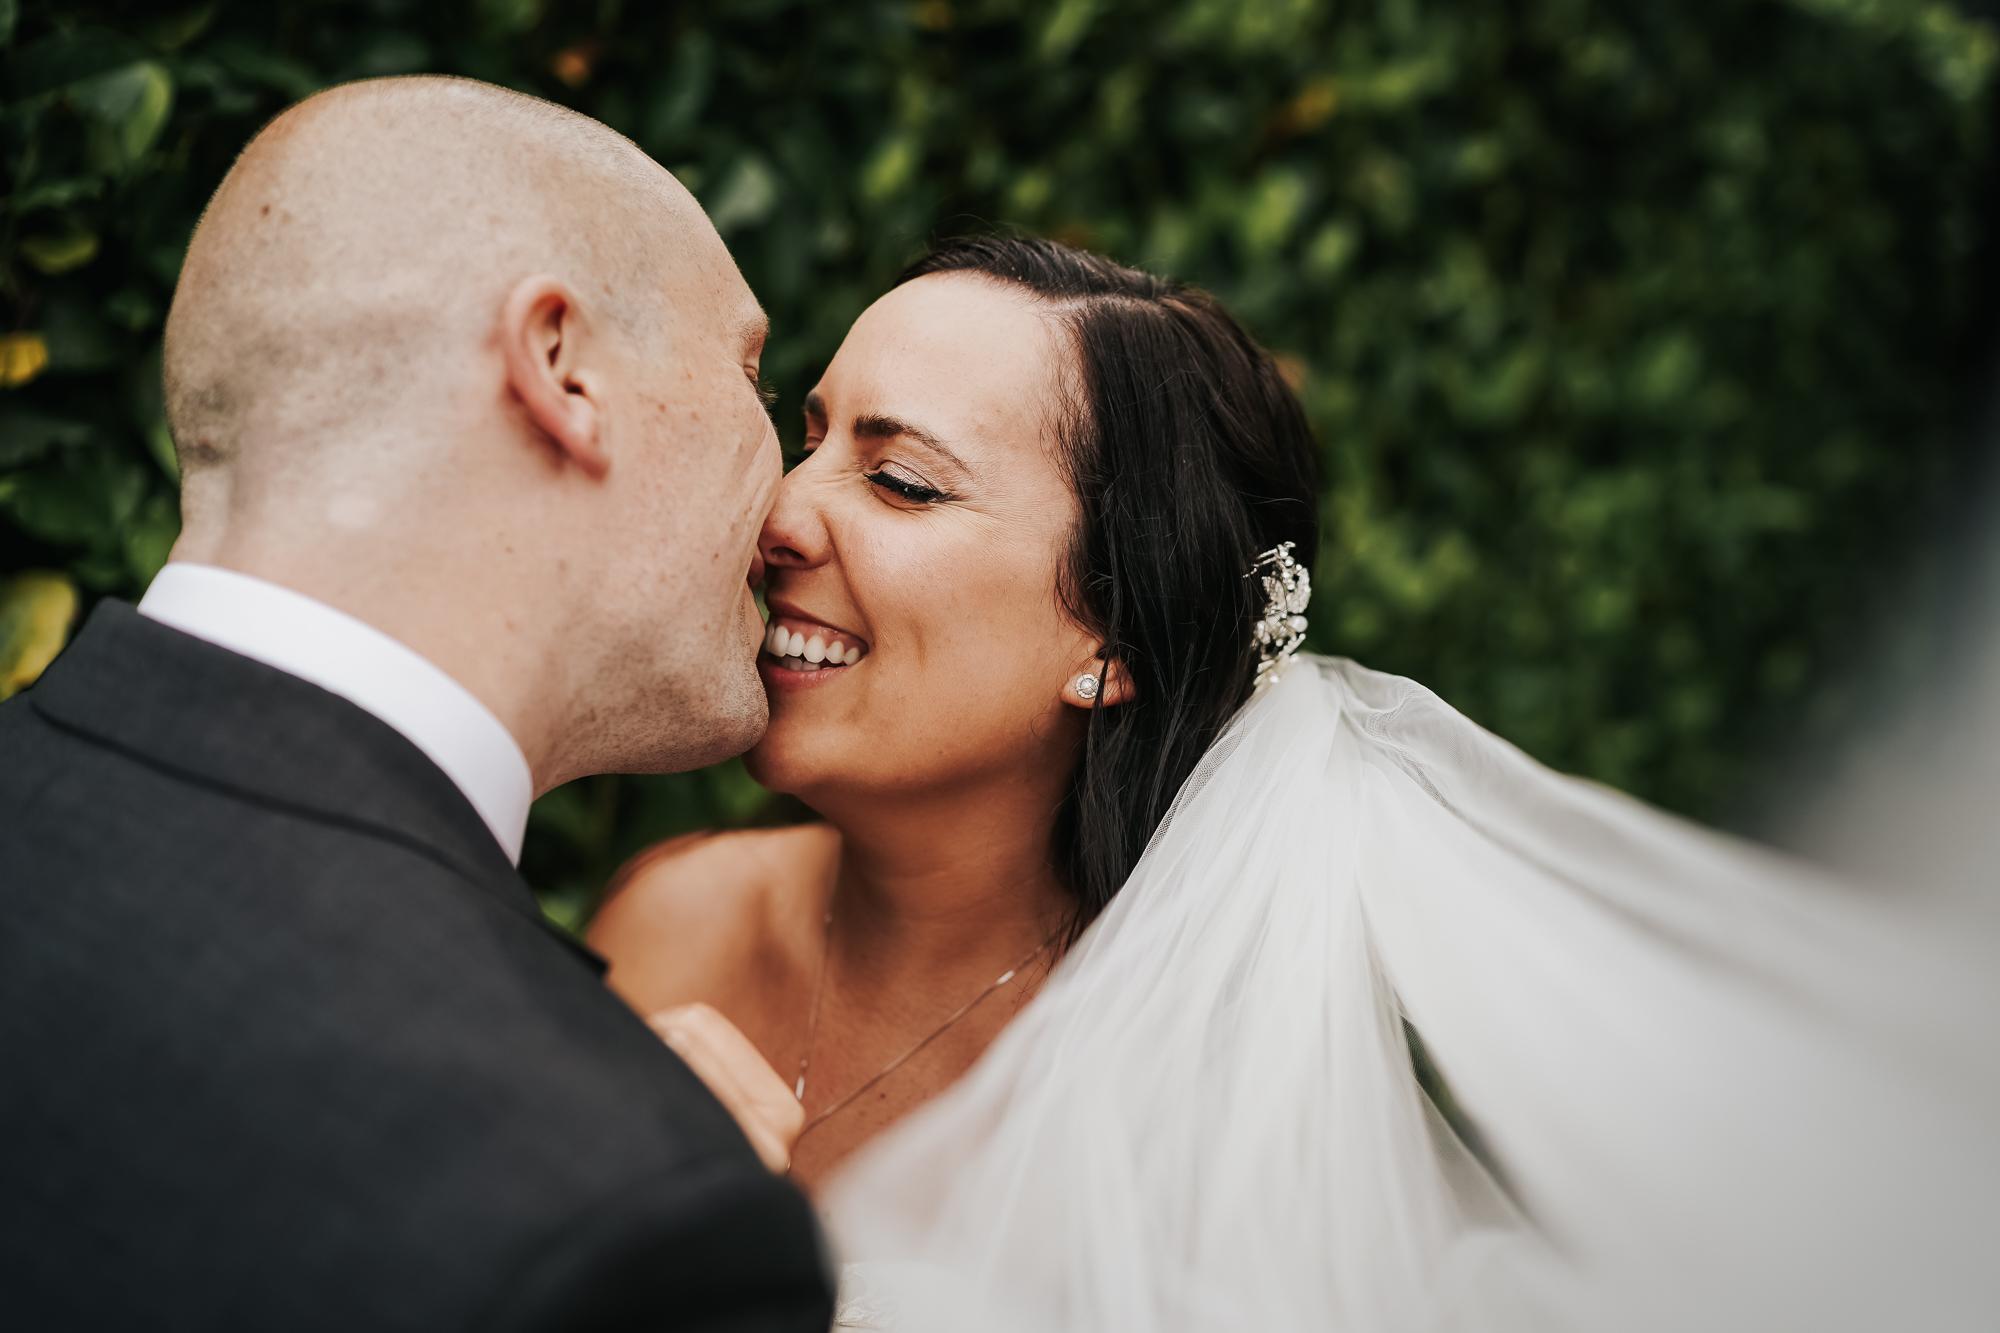 Hyde Bank Farm Wedding Photography Manchester wedding photographer (43 of 49).jpg